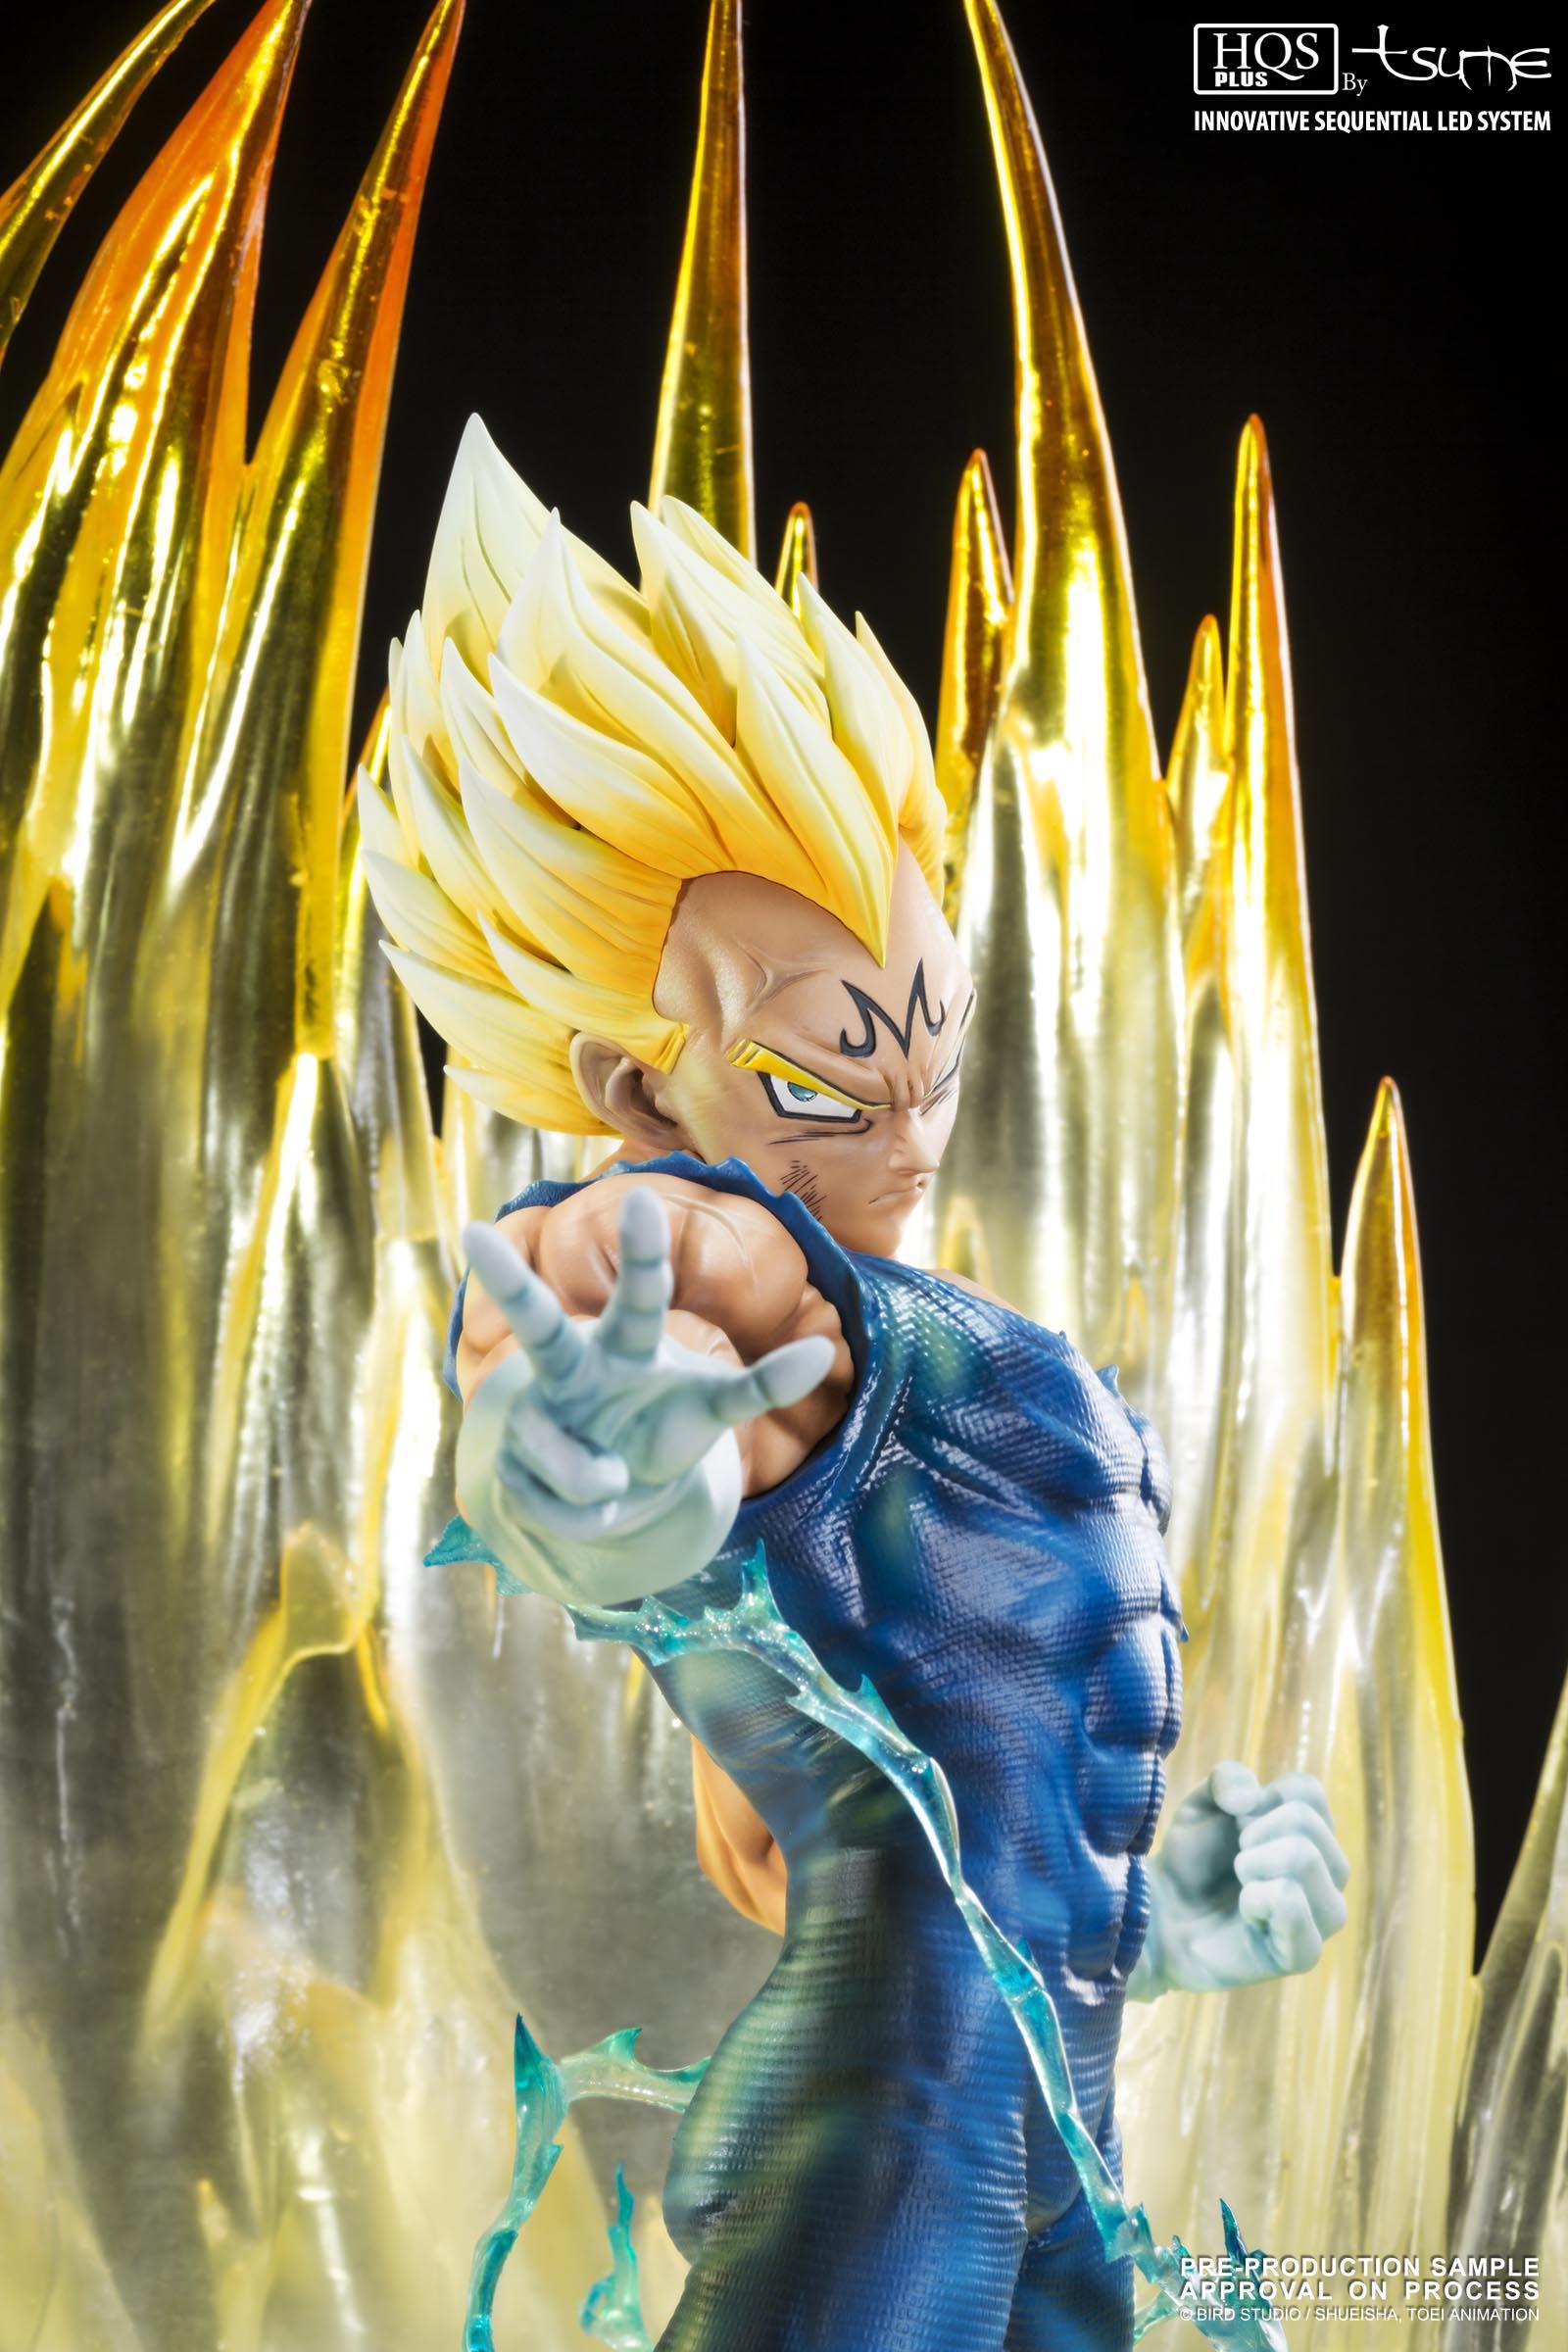 Tsume Art Dragonball Majin Vegeta HQS Plus Statue